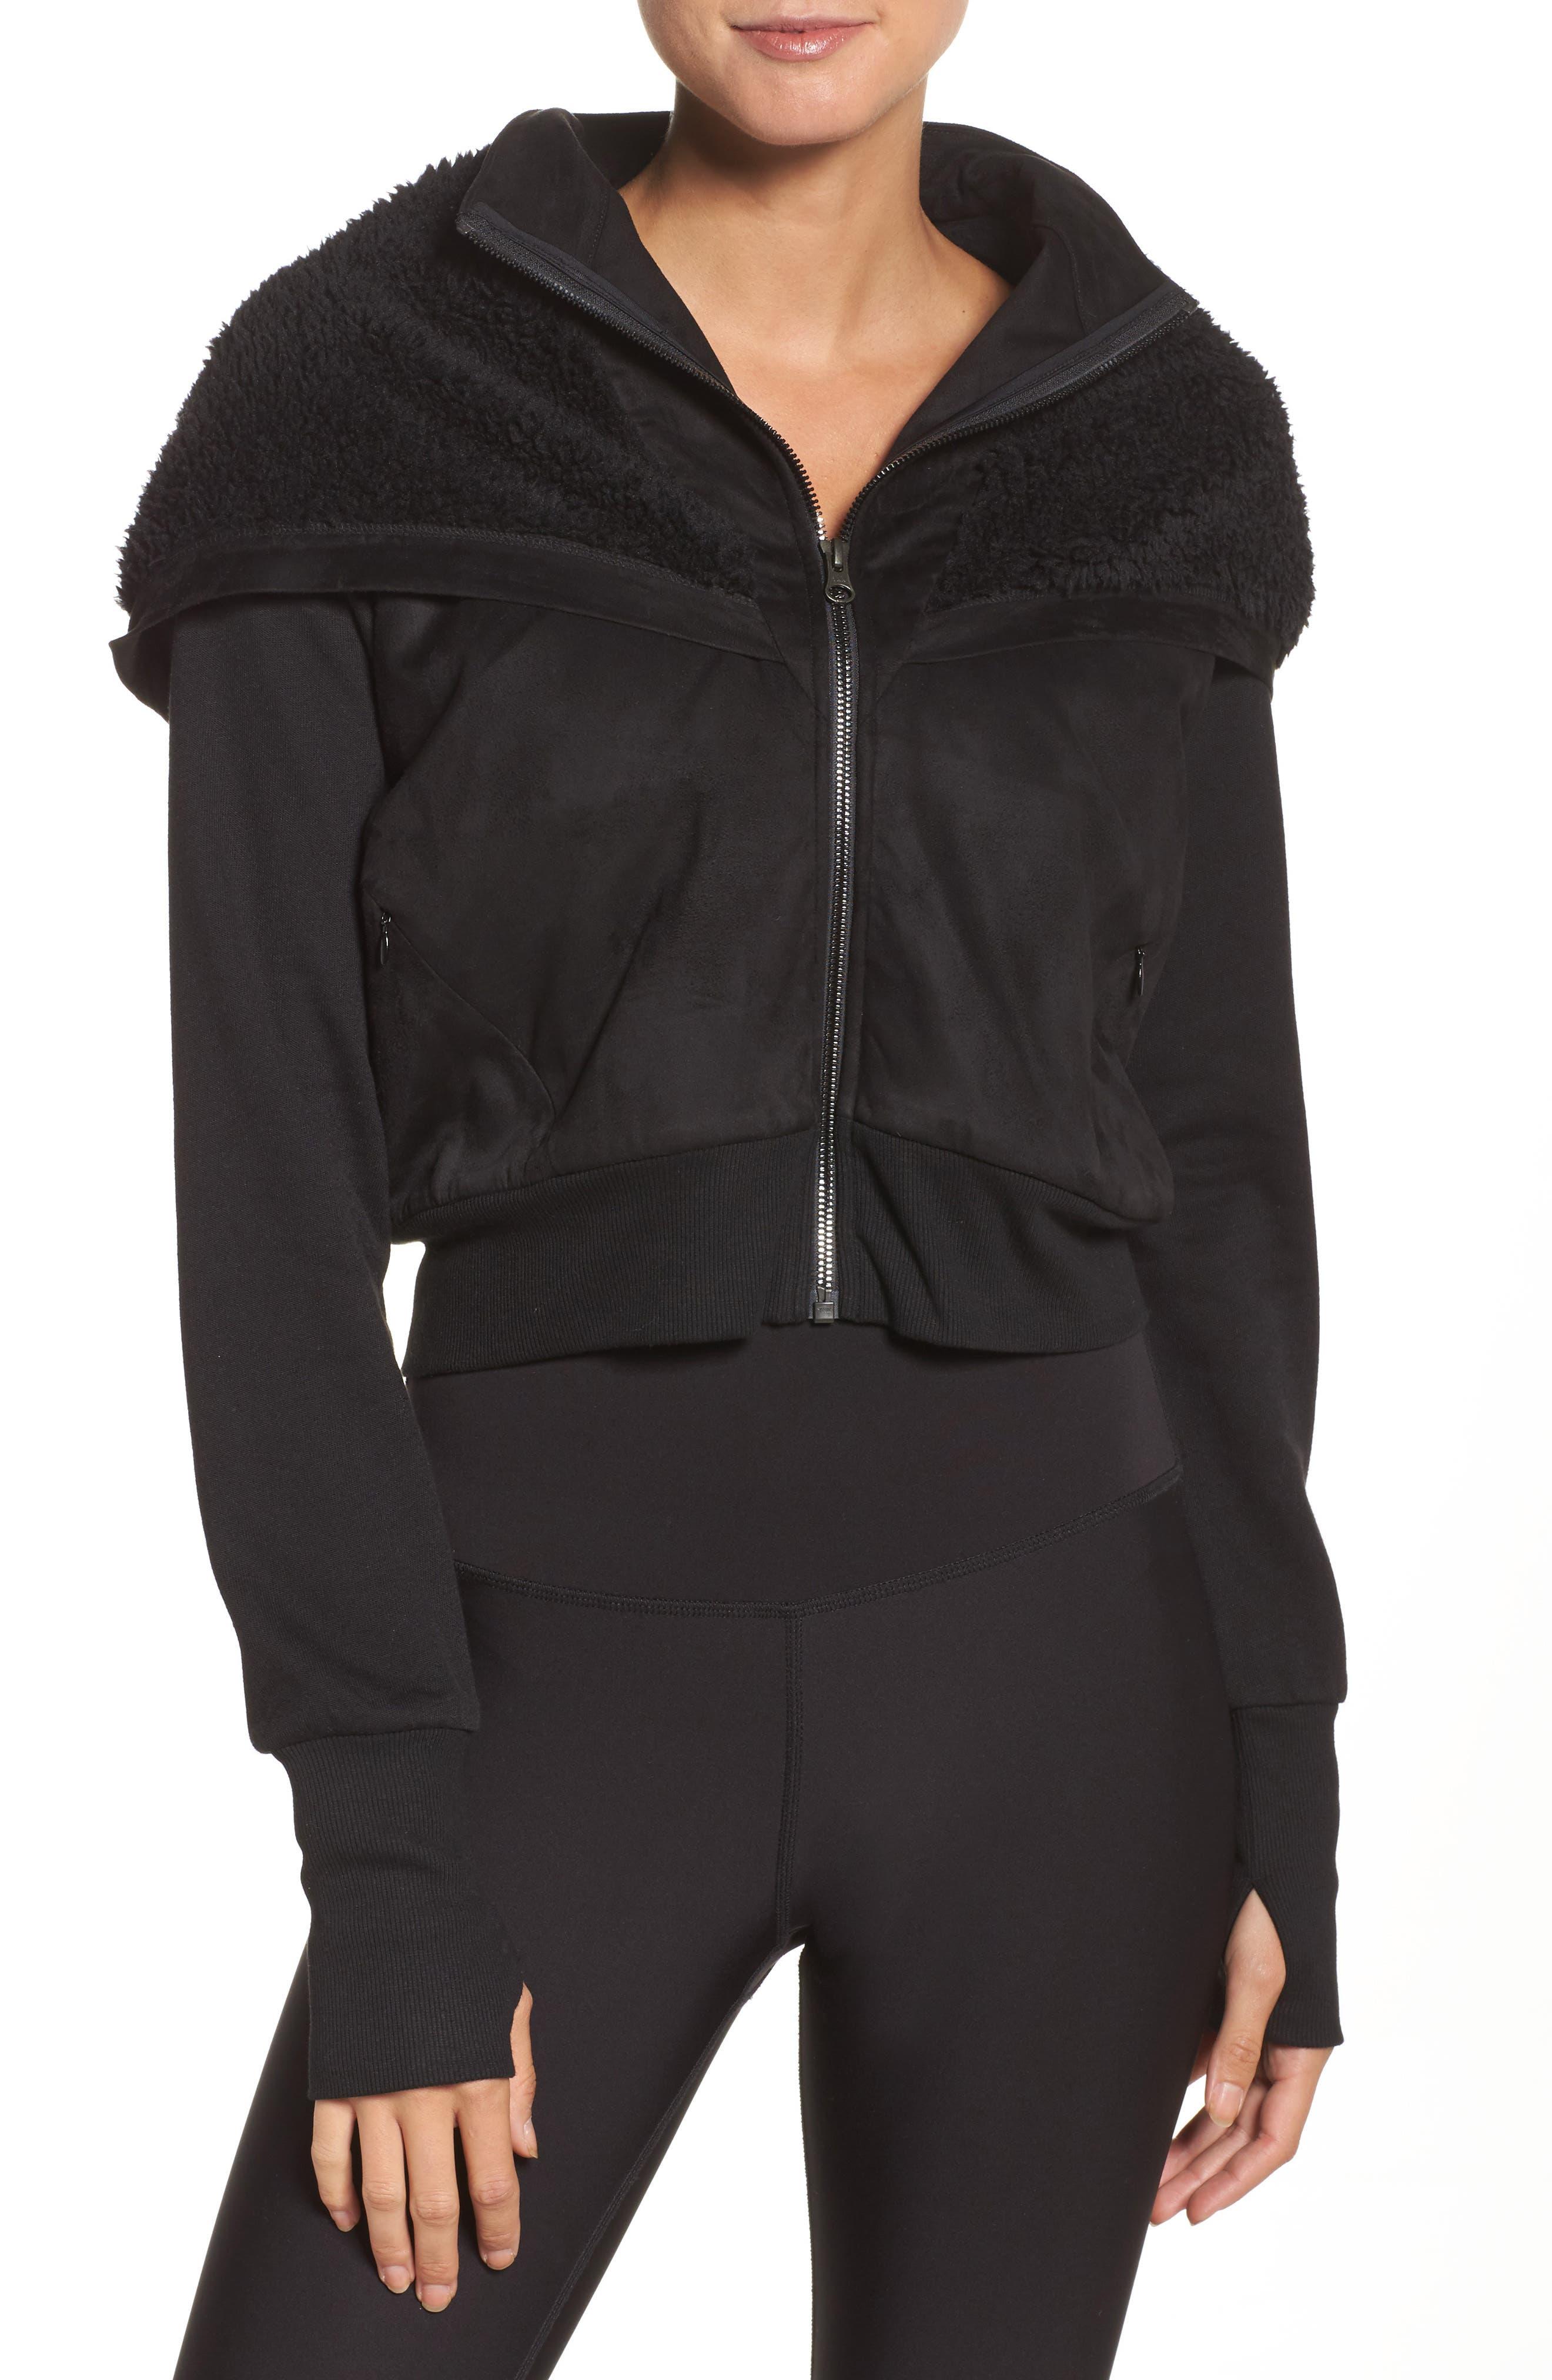 Main Image - Alo LA Winter Faux Fur Lined Jacket